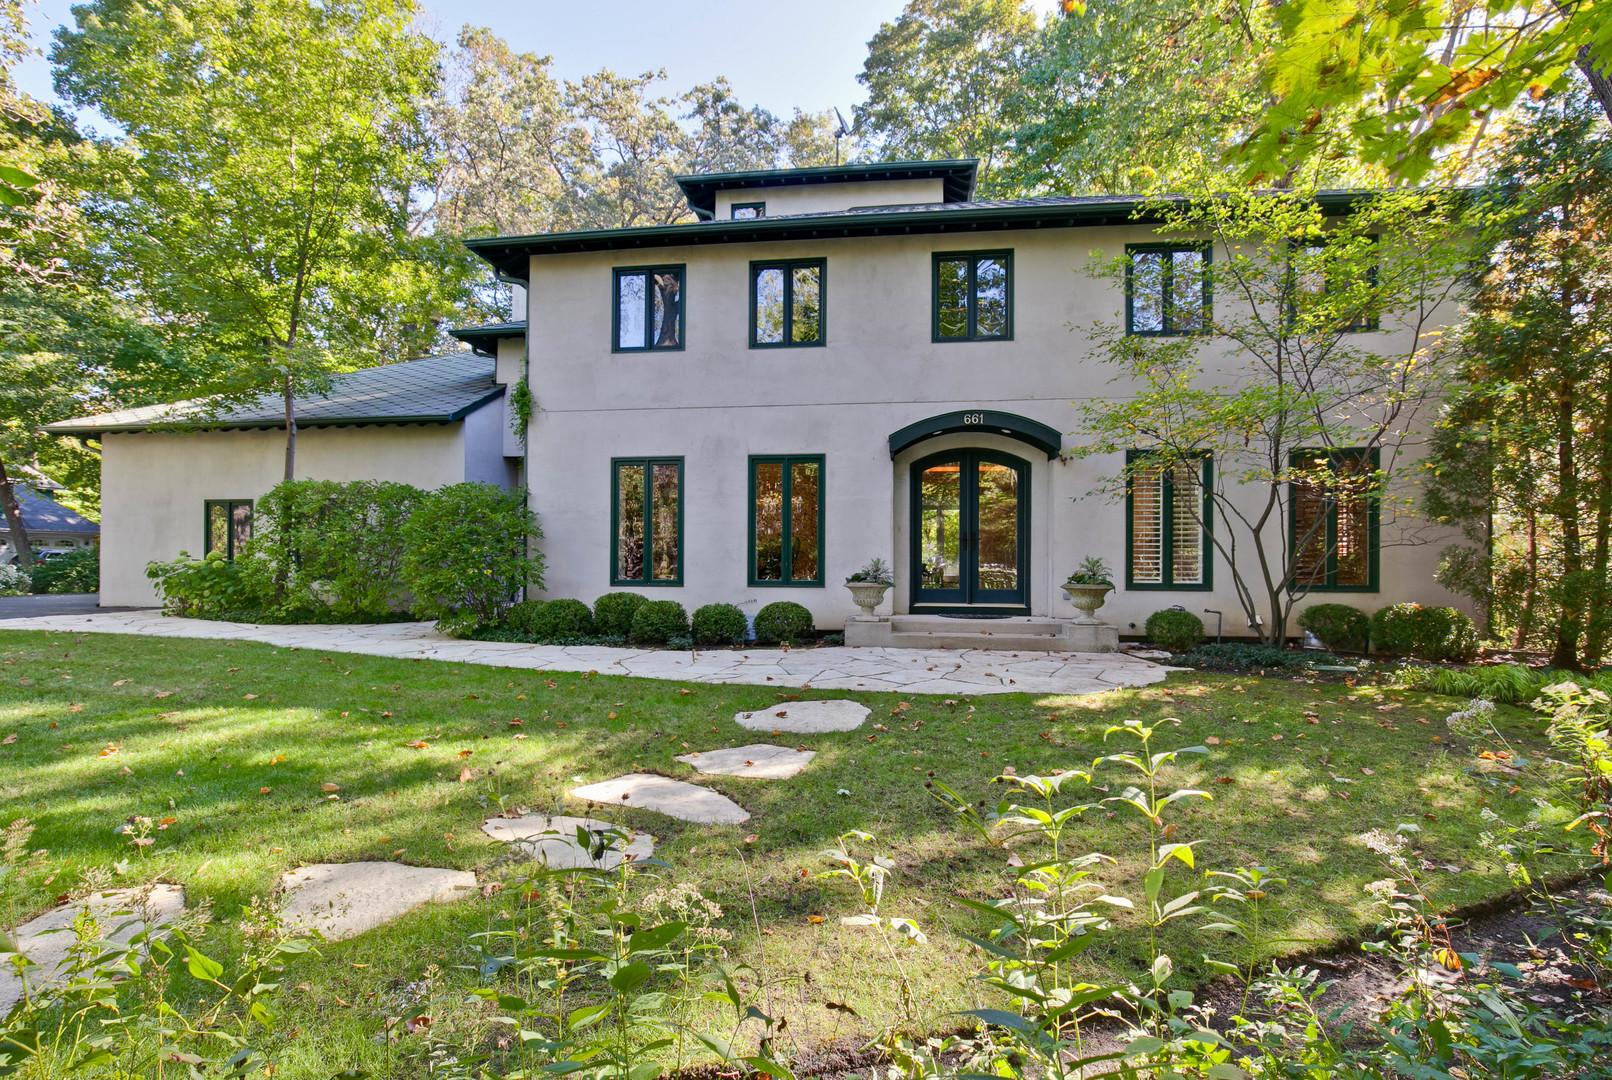 661 Maple Avenue, Lake Bluff, Illinois 60044